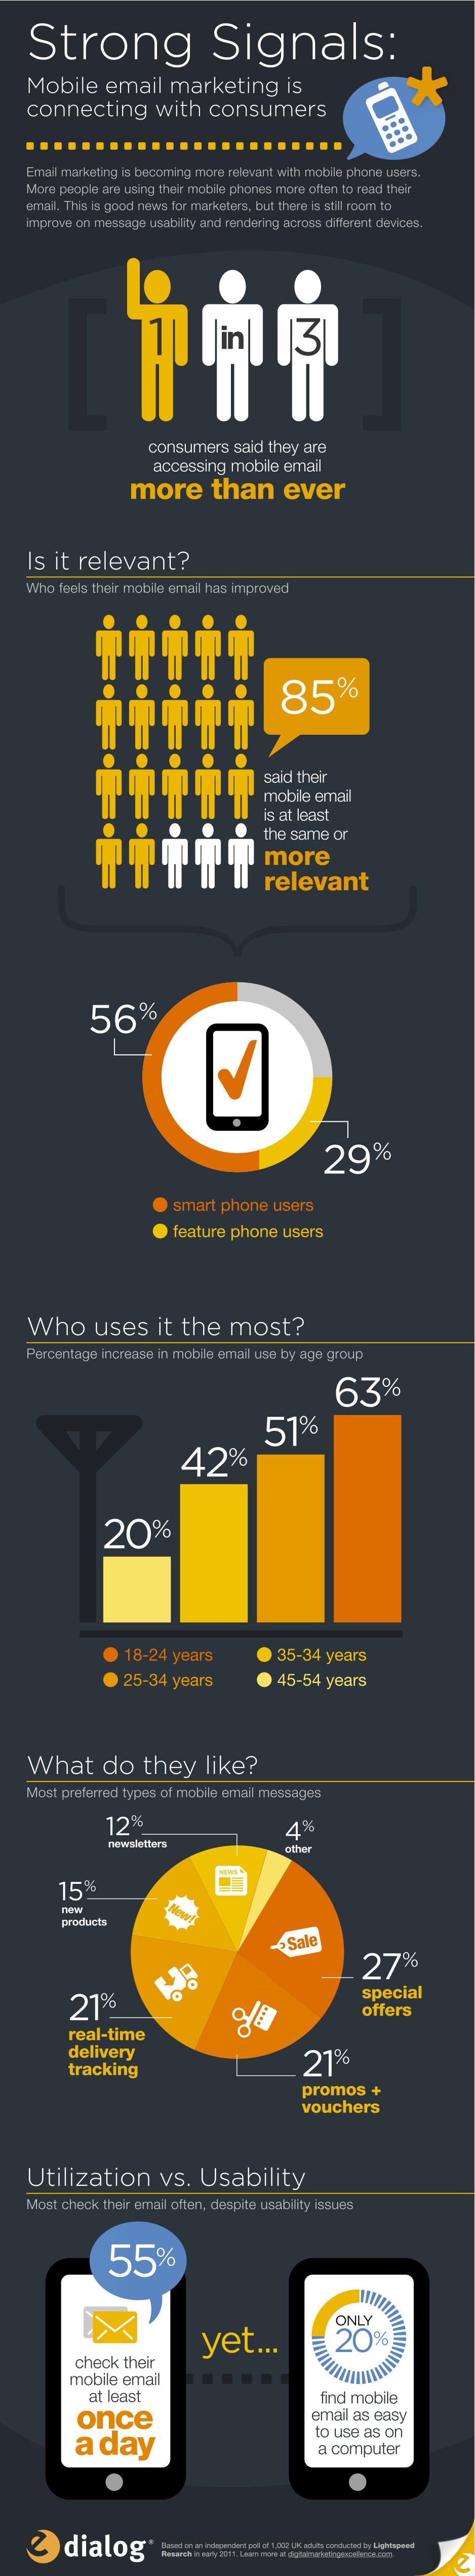 eD-MobileEmail-Infographic-gc